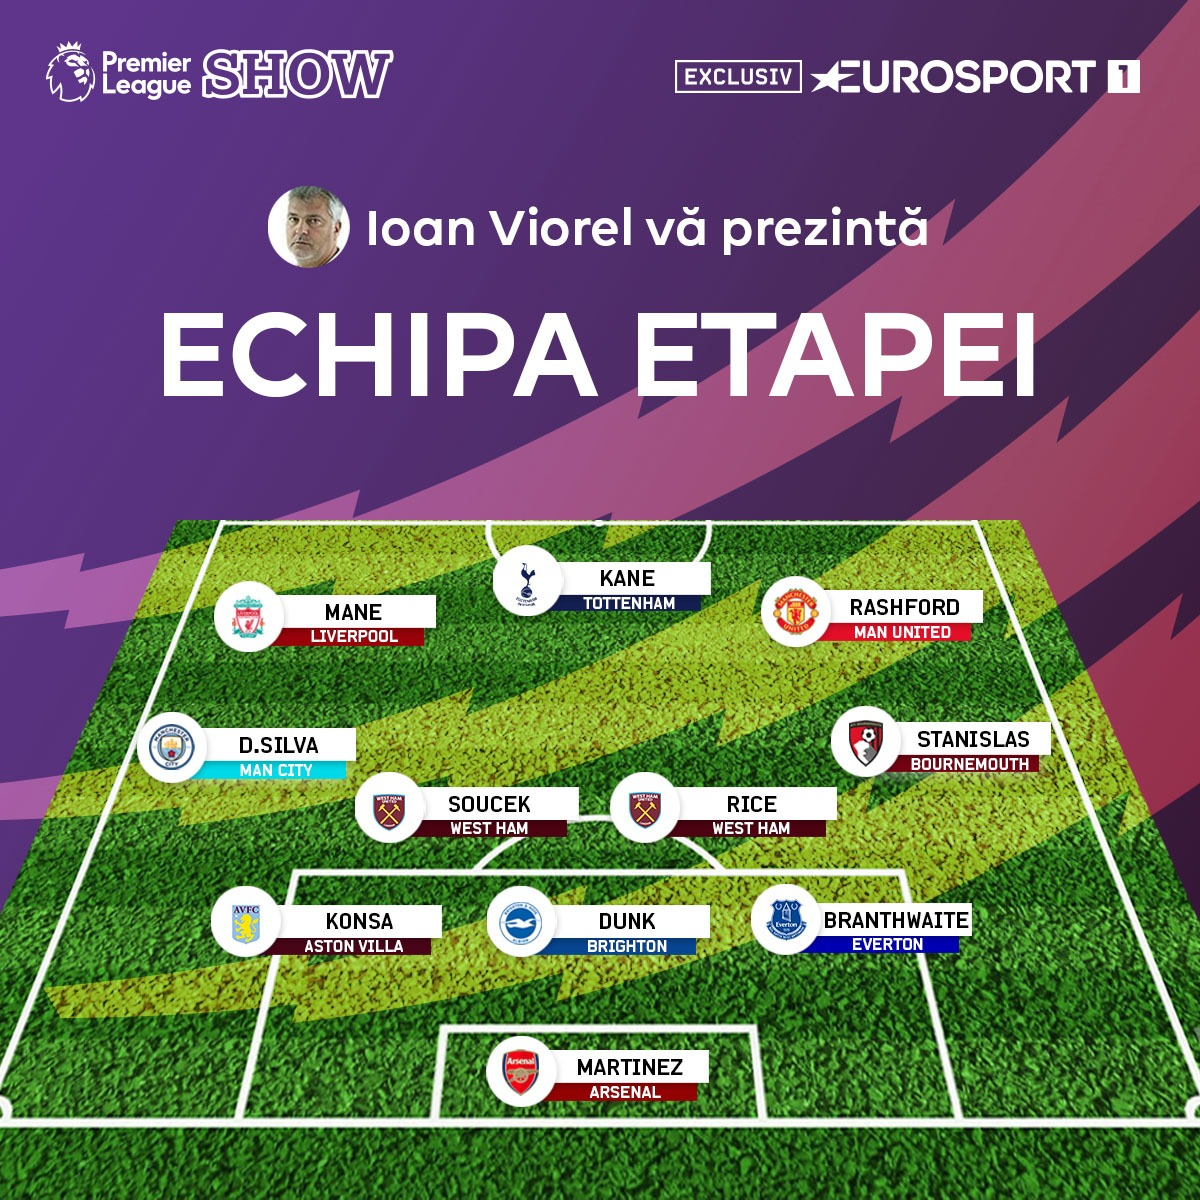 https://i.eurosport.com/2020/07/18/2851833.png